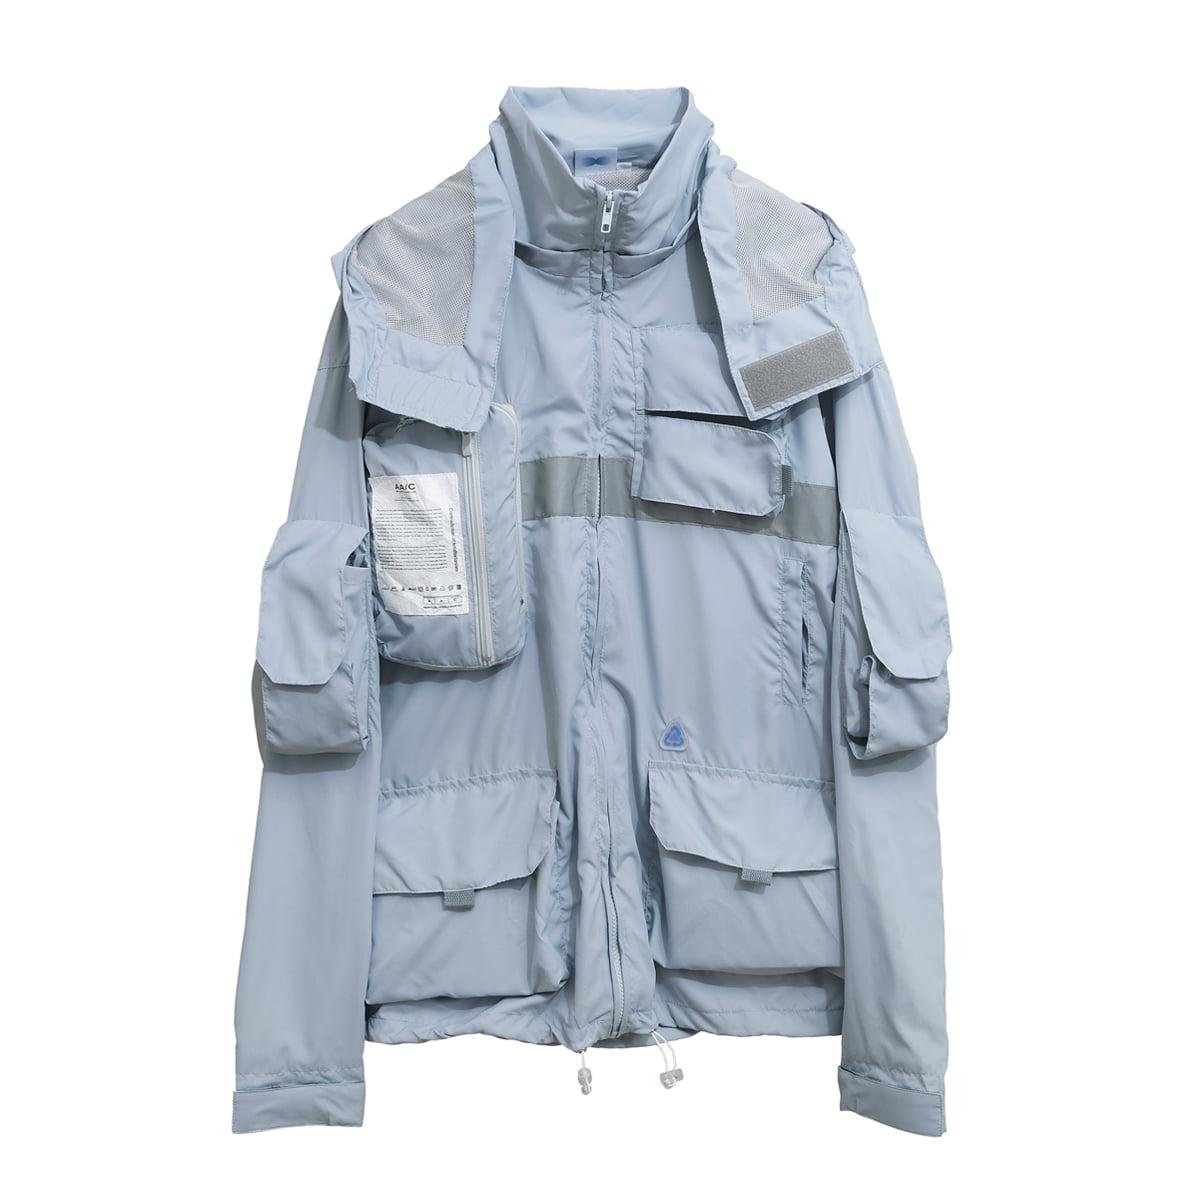 0.20 Smock Jacket (sky blue)